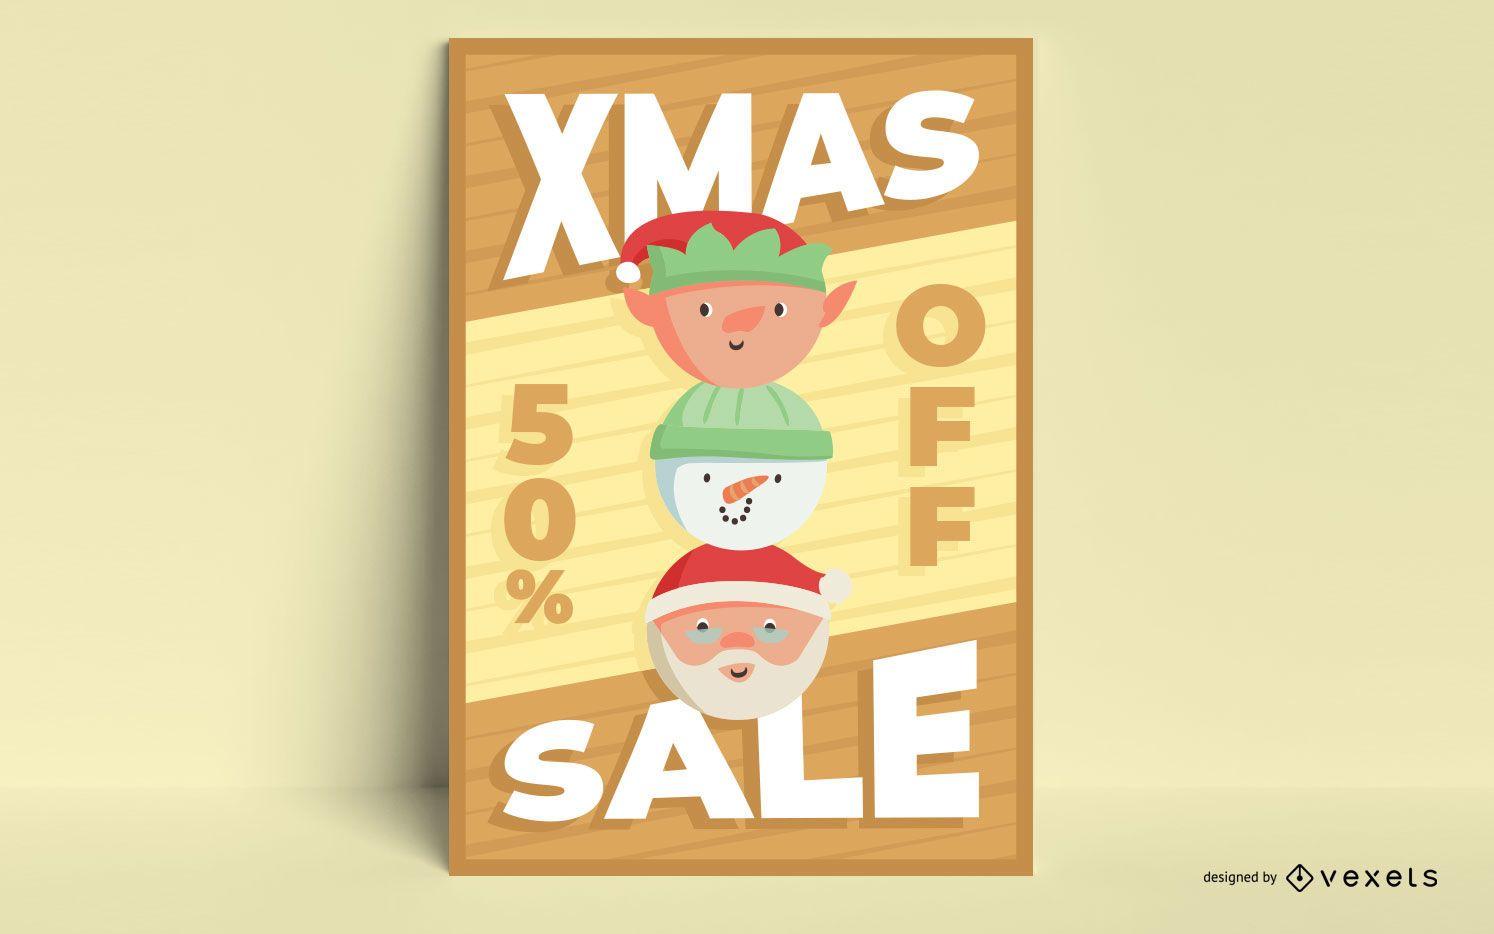 Xmas sale poster design